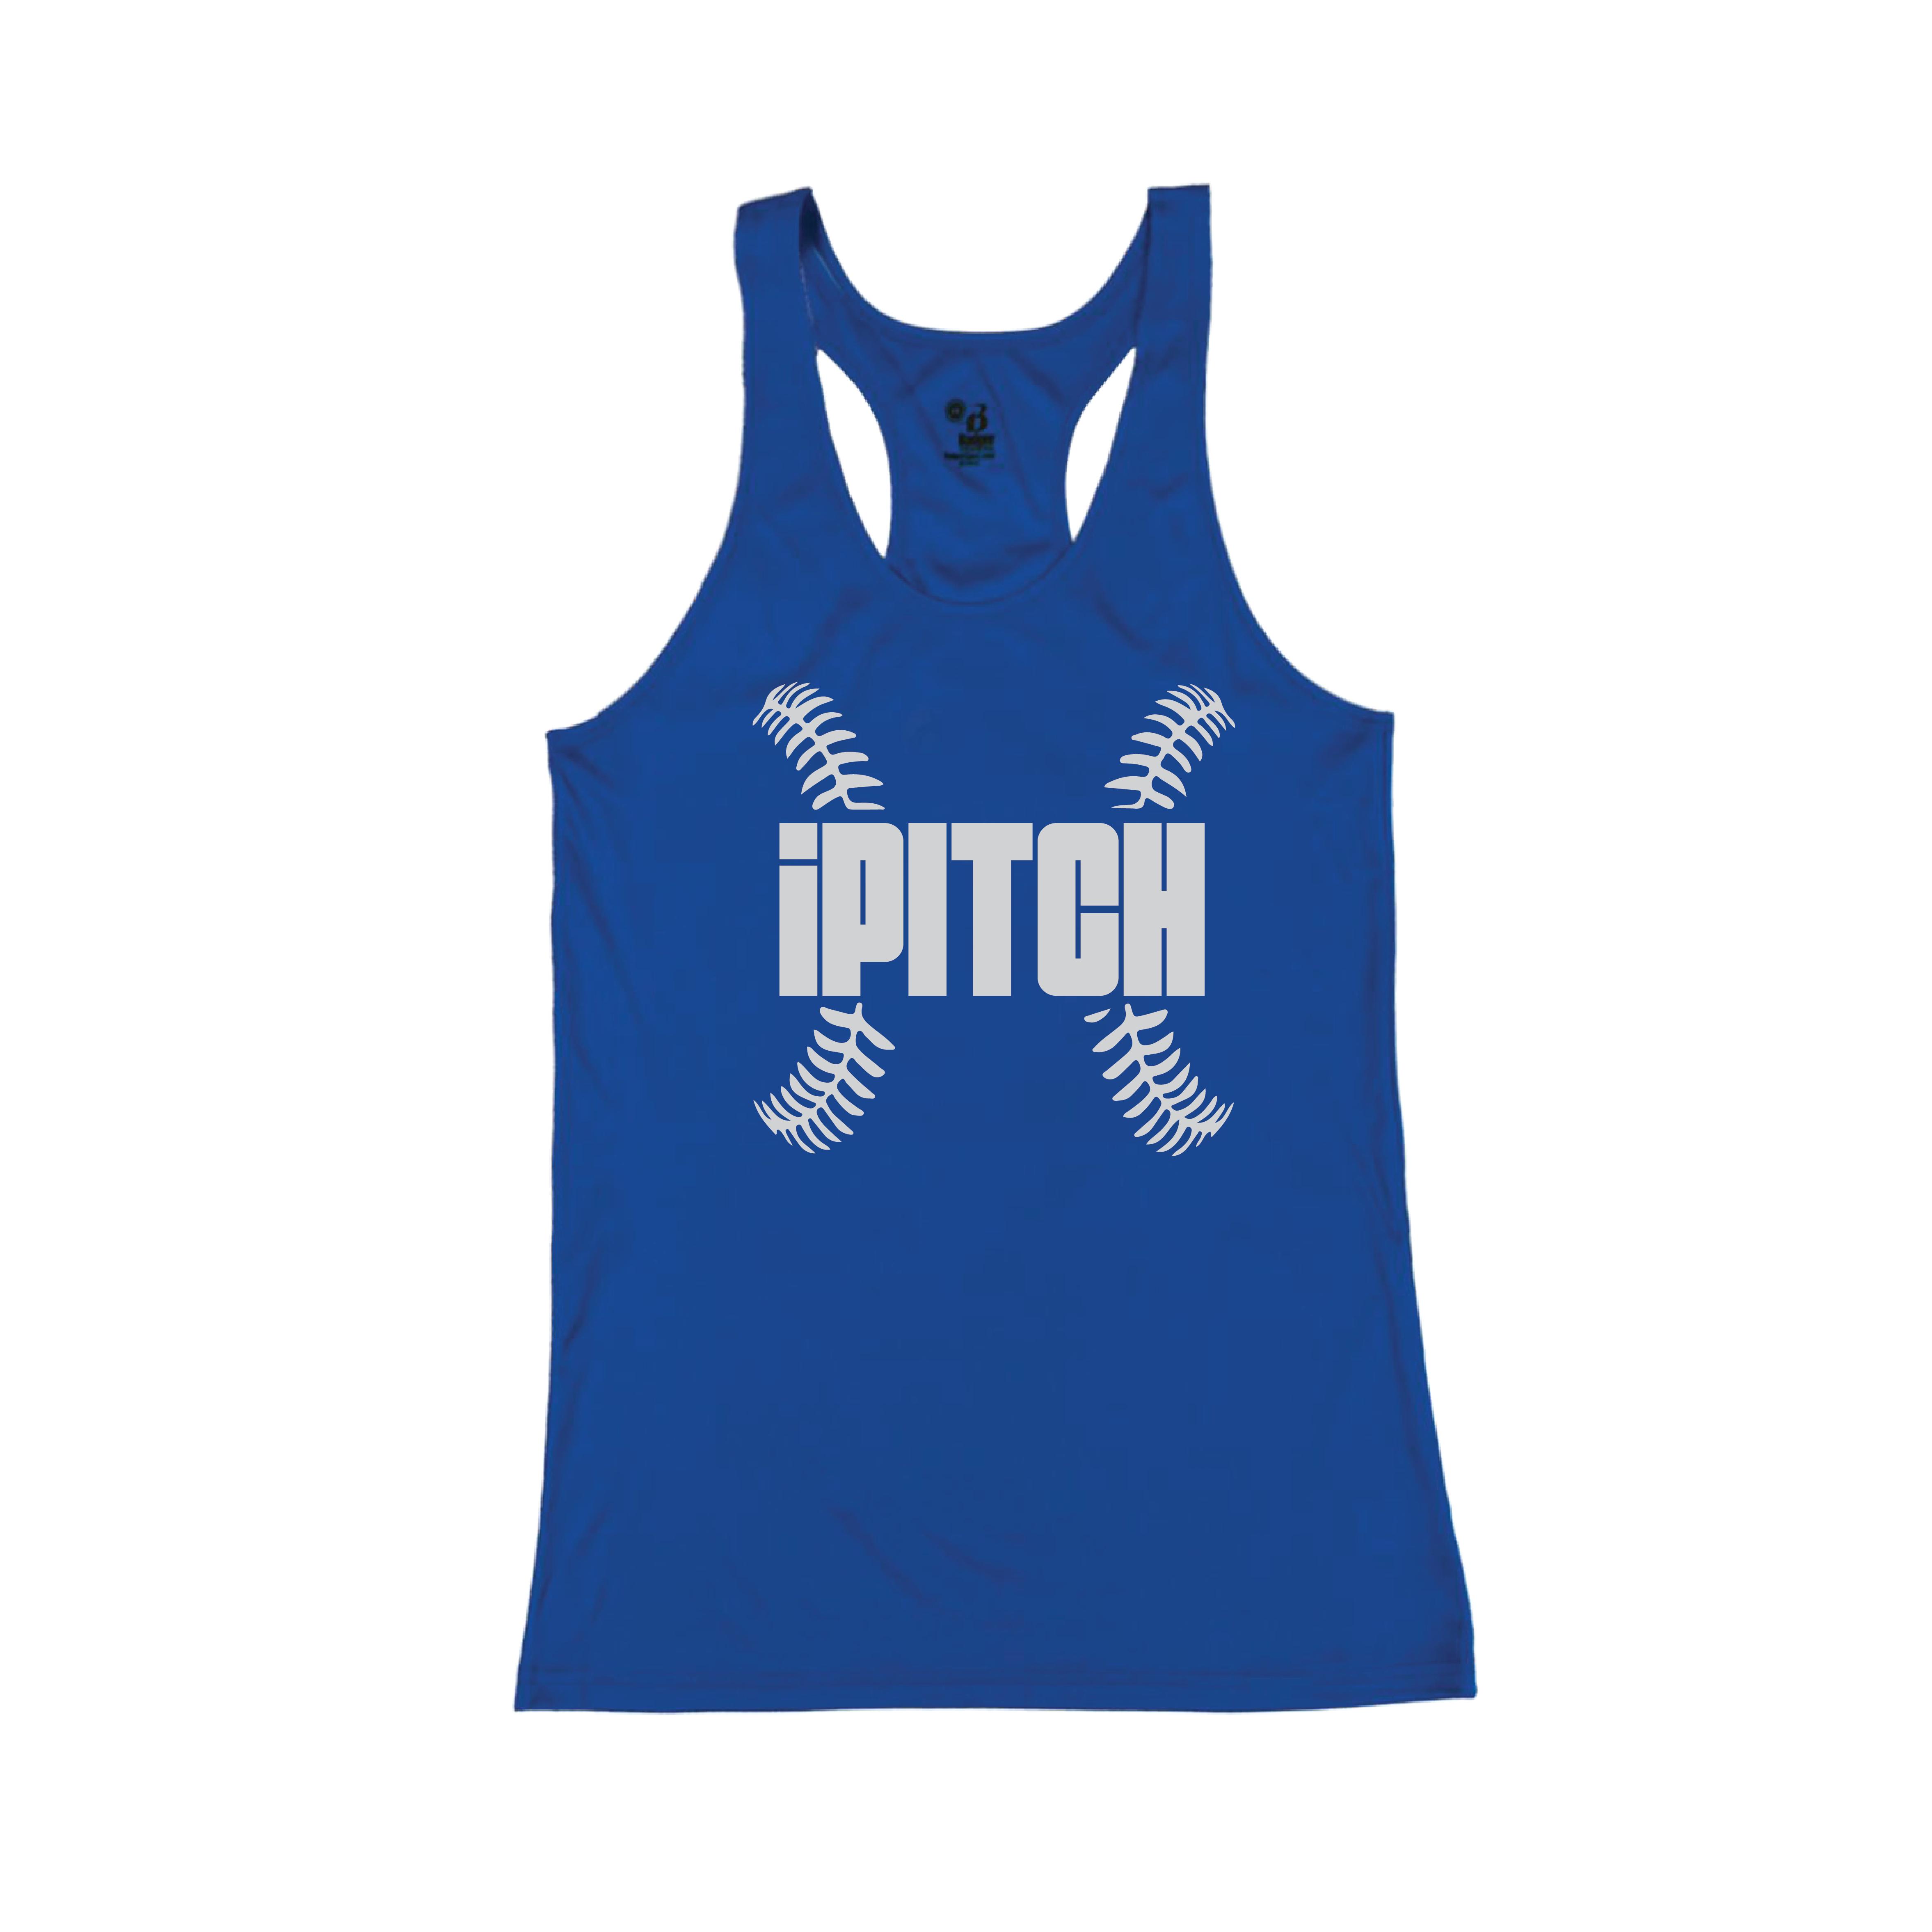 Softball blueTank